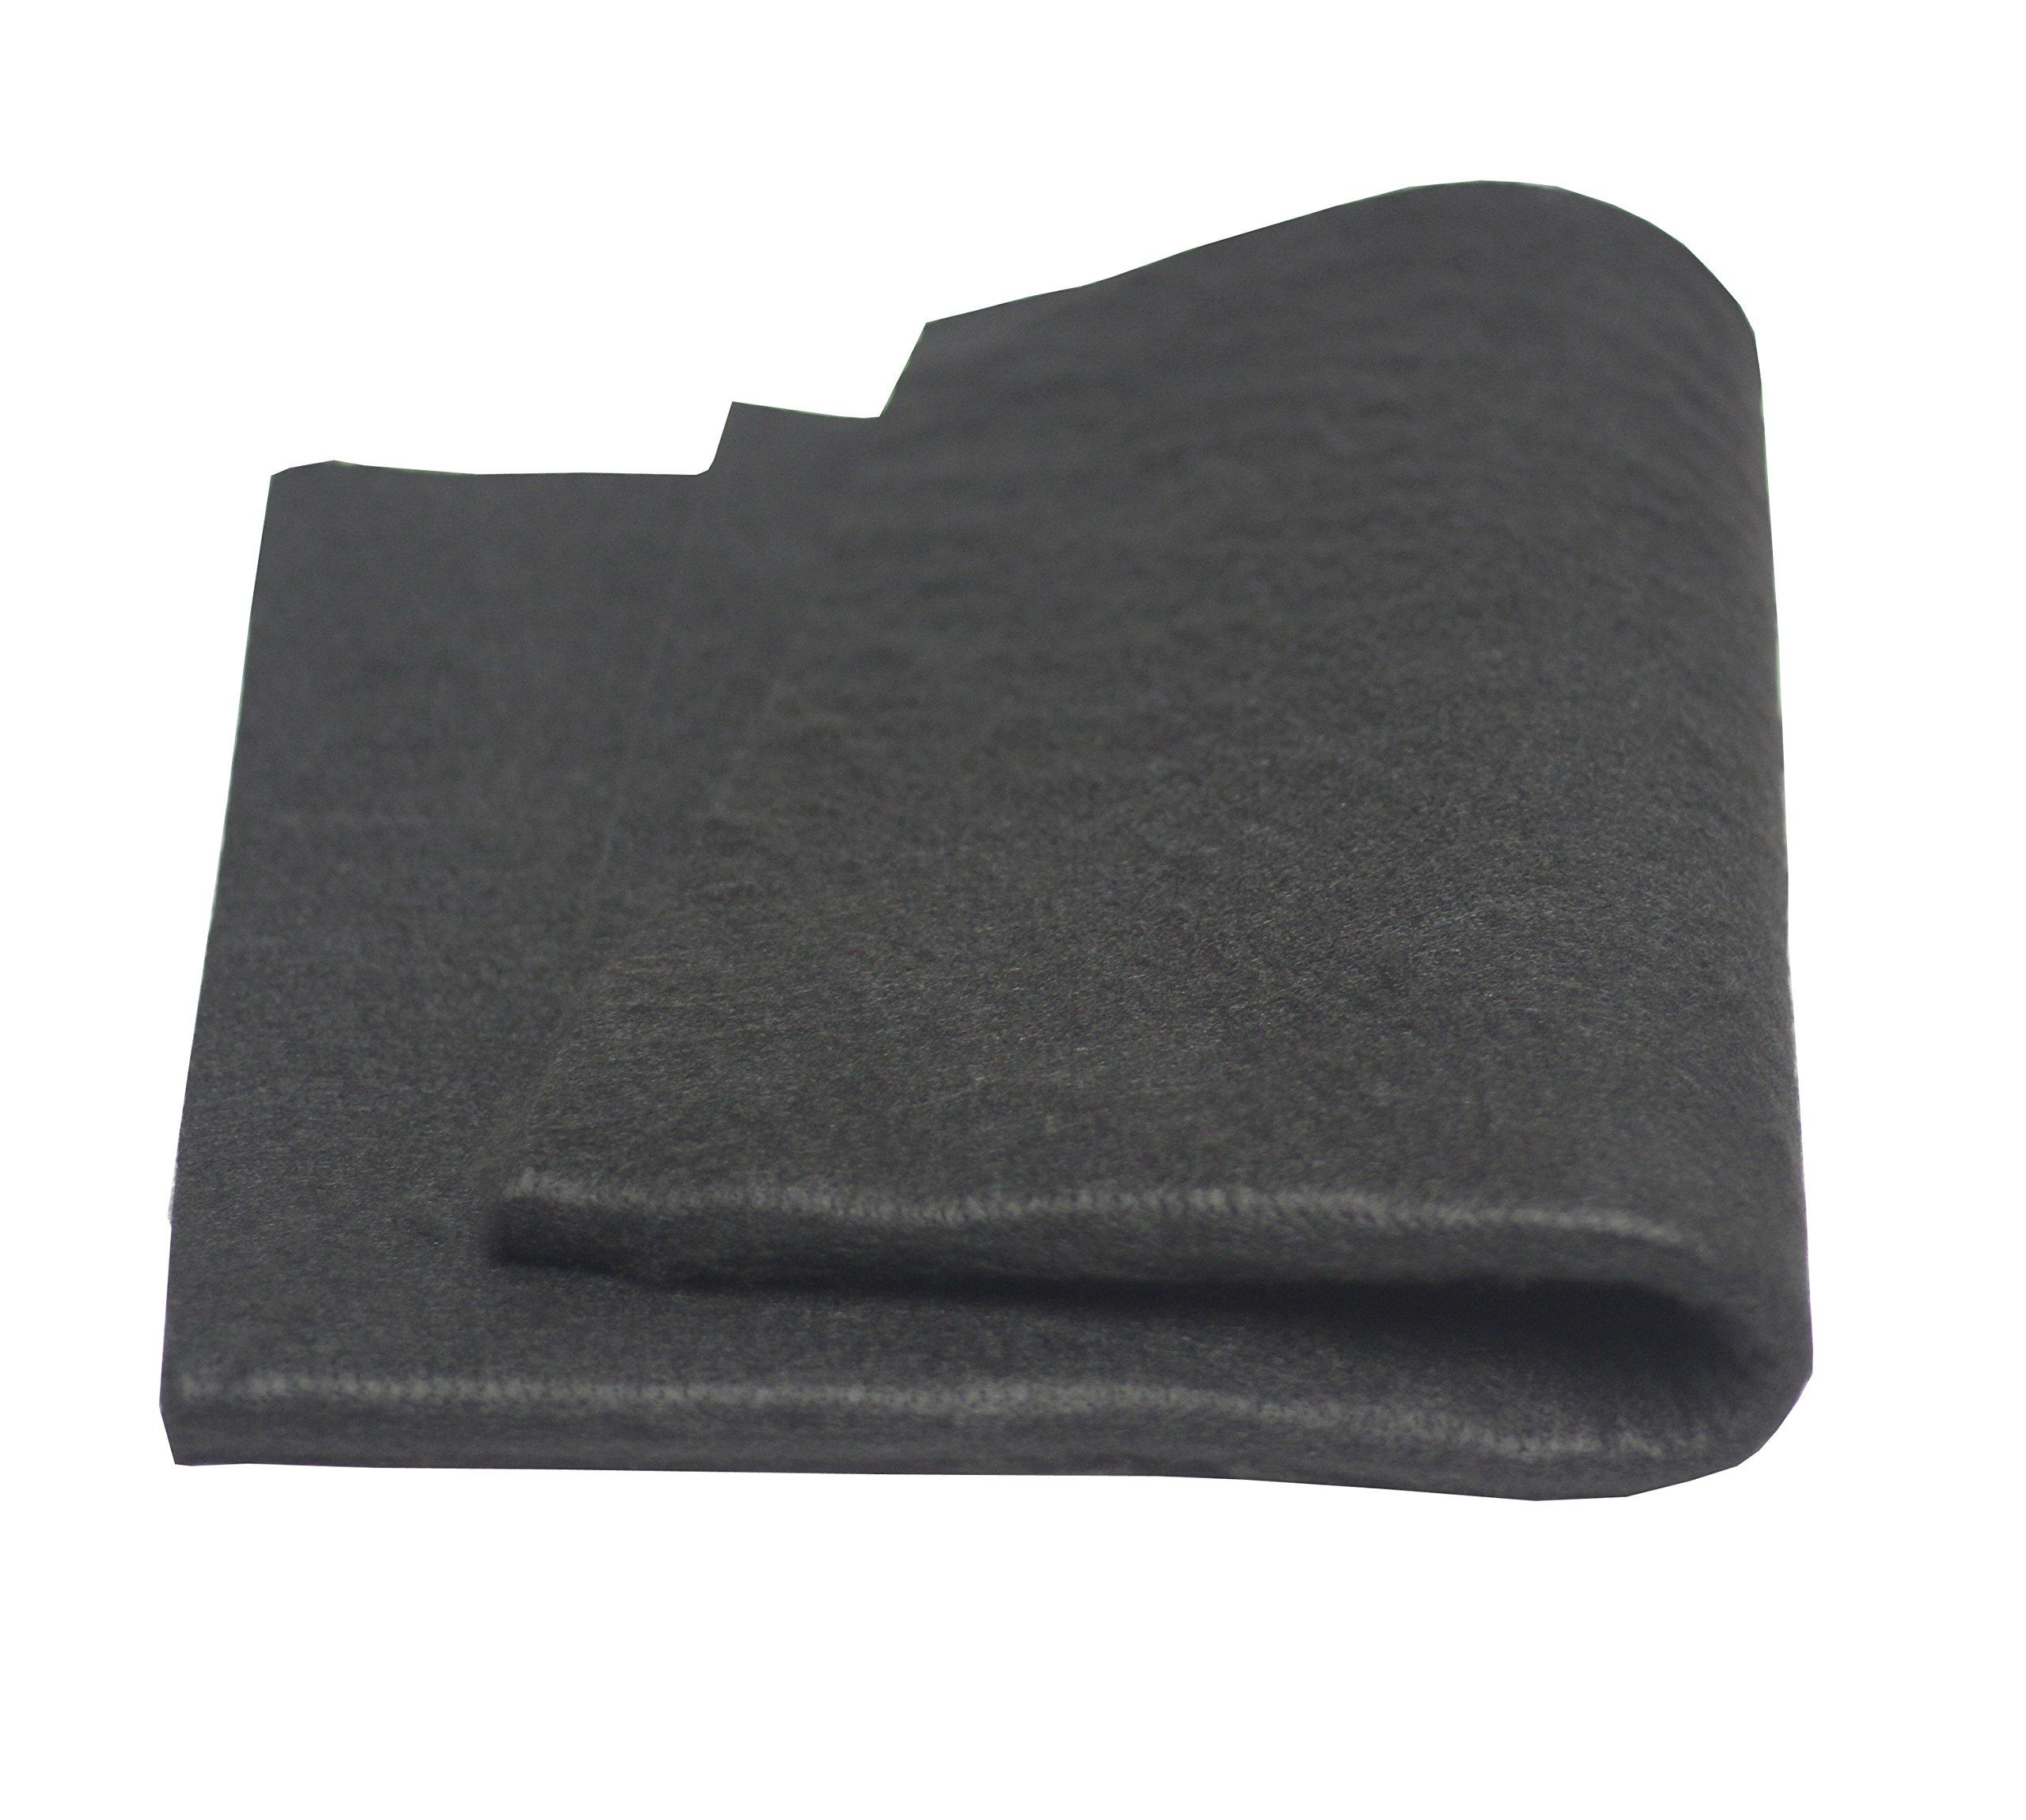 Hansway High Temp 18'' X 24''(WL) Felt Carbon Fiber Welding Blankets Black (18 x 24 inches)